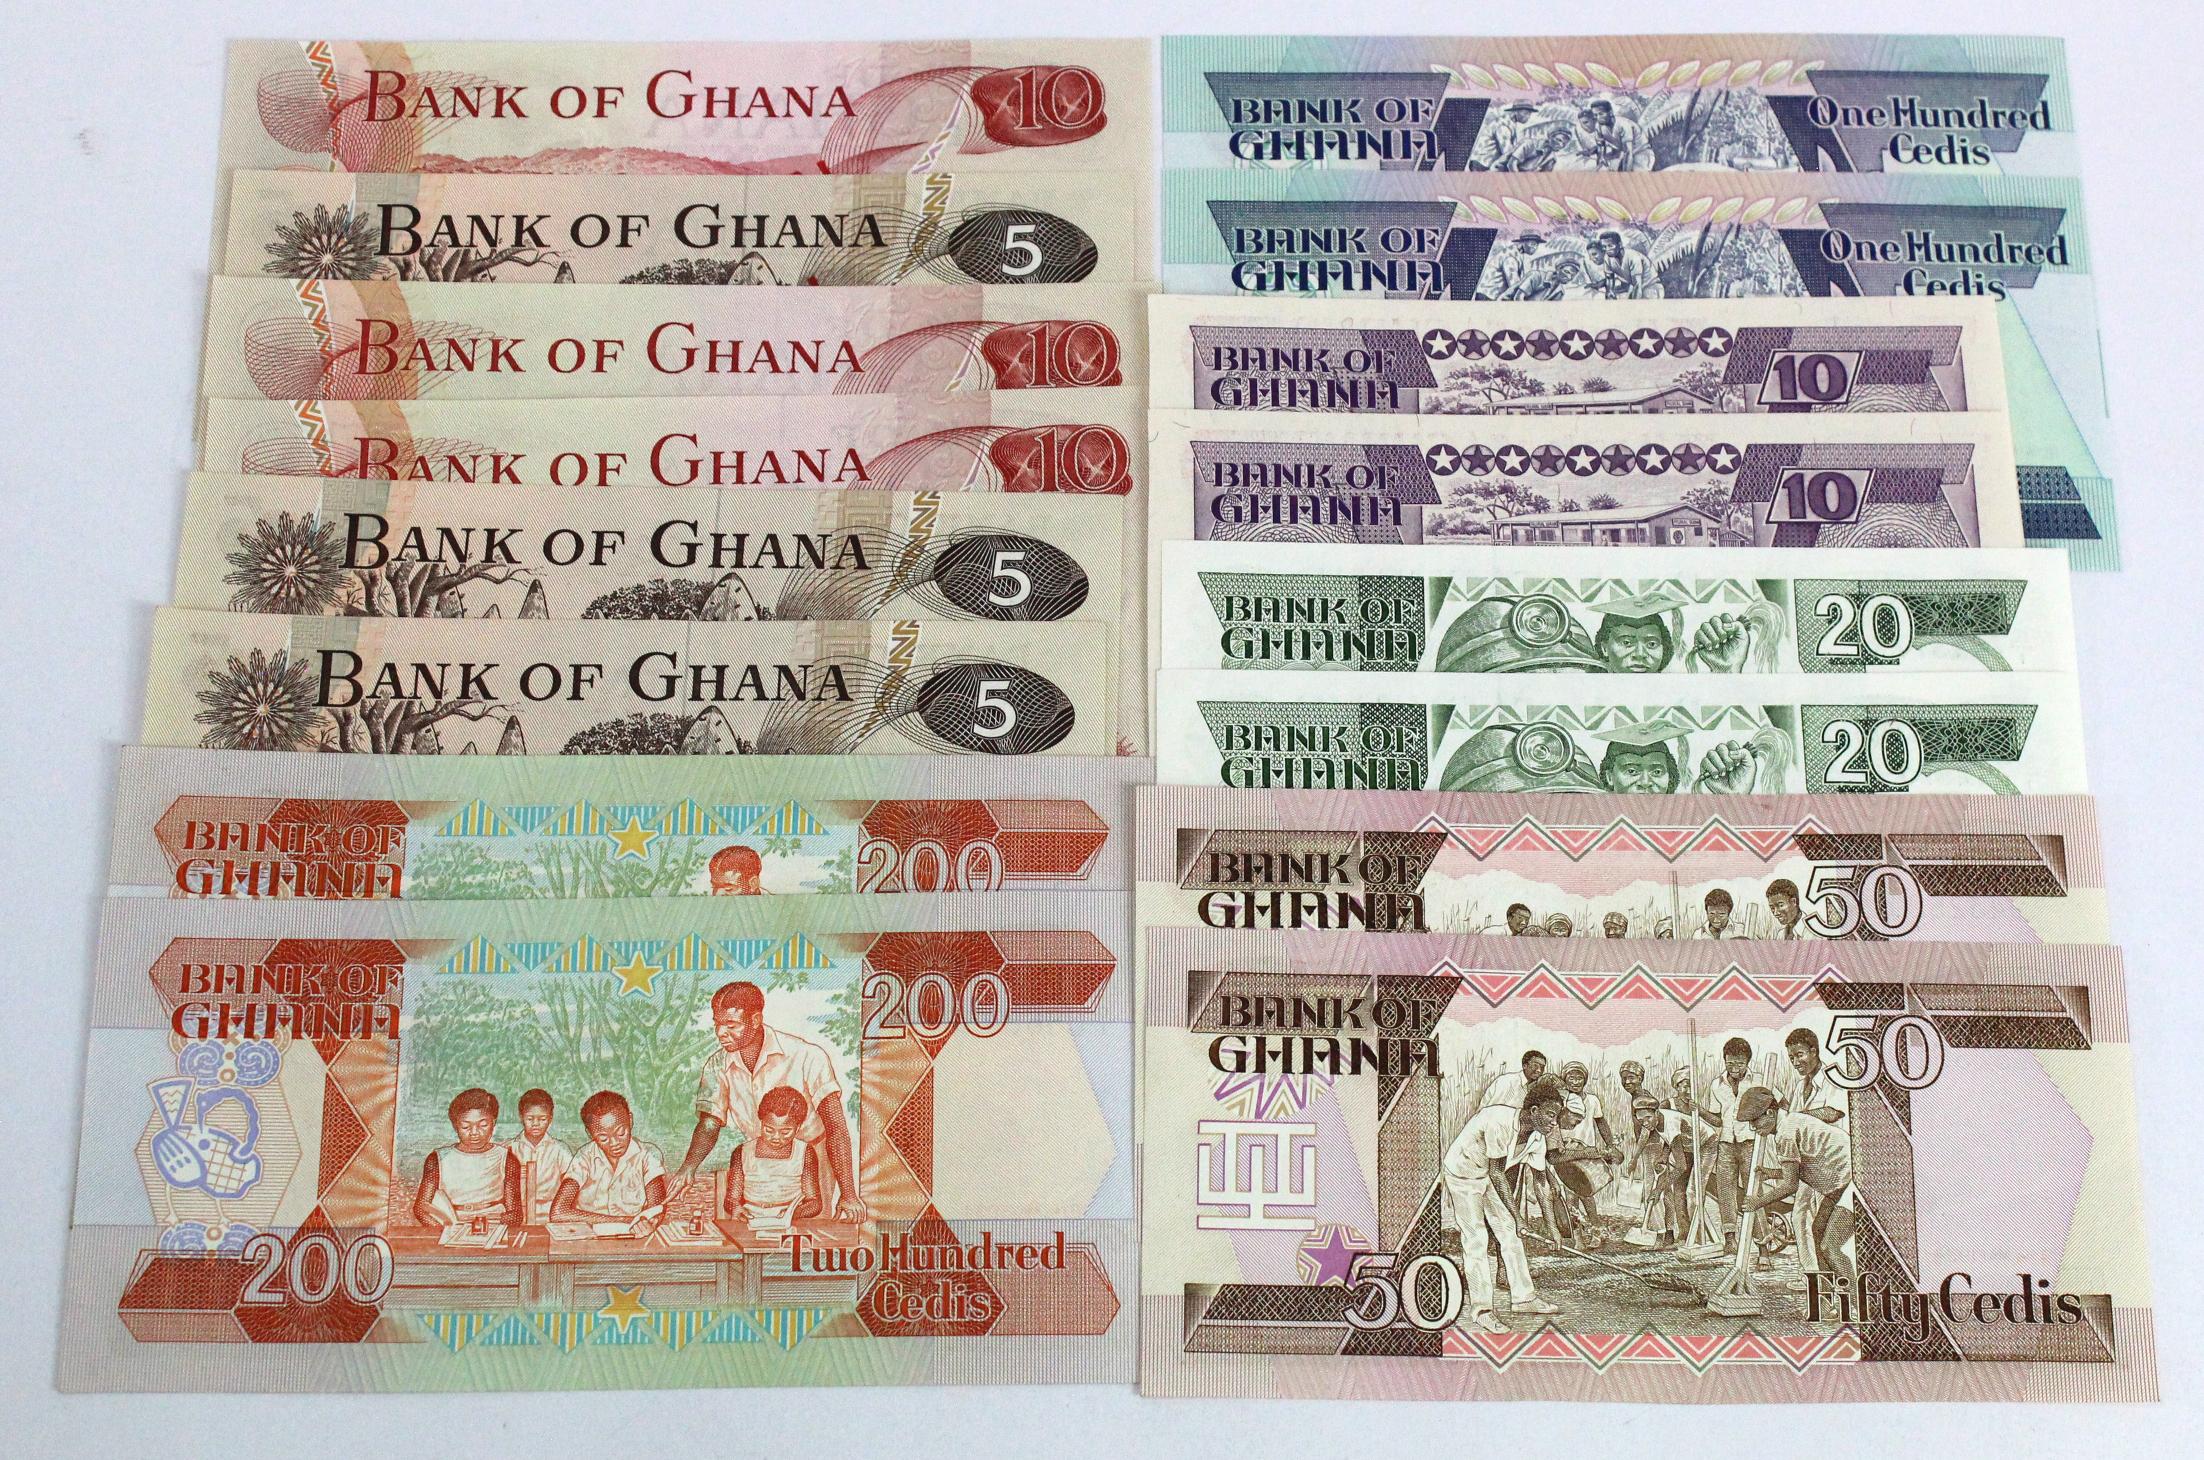 Ghana (16), 200 Cedis (2), 100 Cedis (2), 50 Cedis (2), 20 Cedis (2) & 10 Cedis (2), (these Z/1 - Image 2 of 2